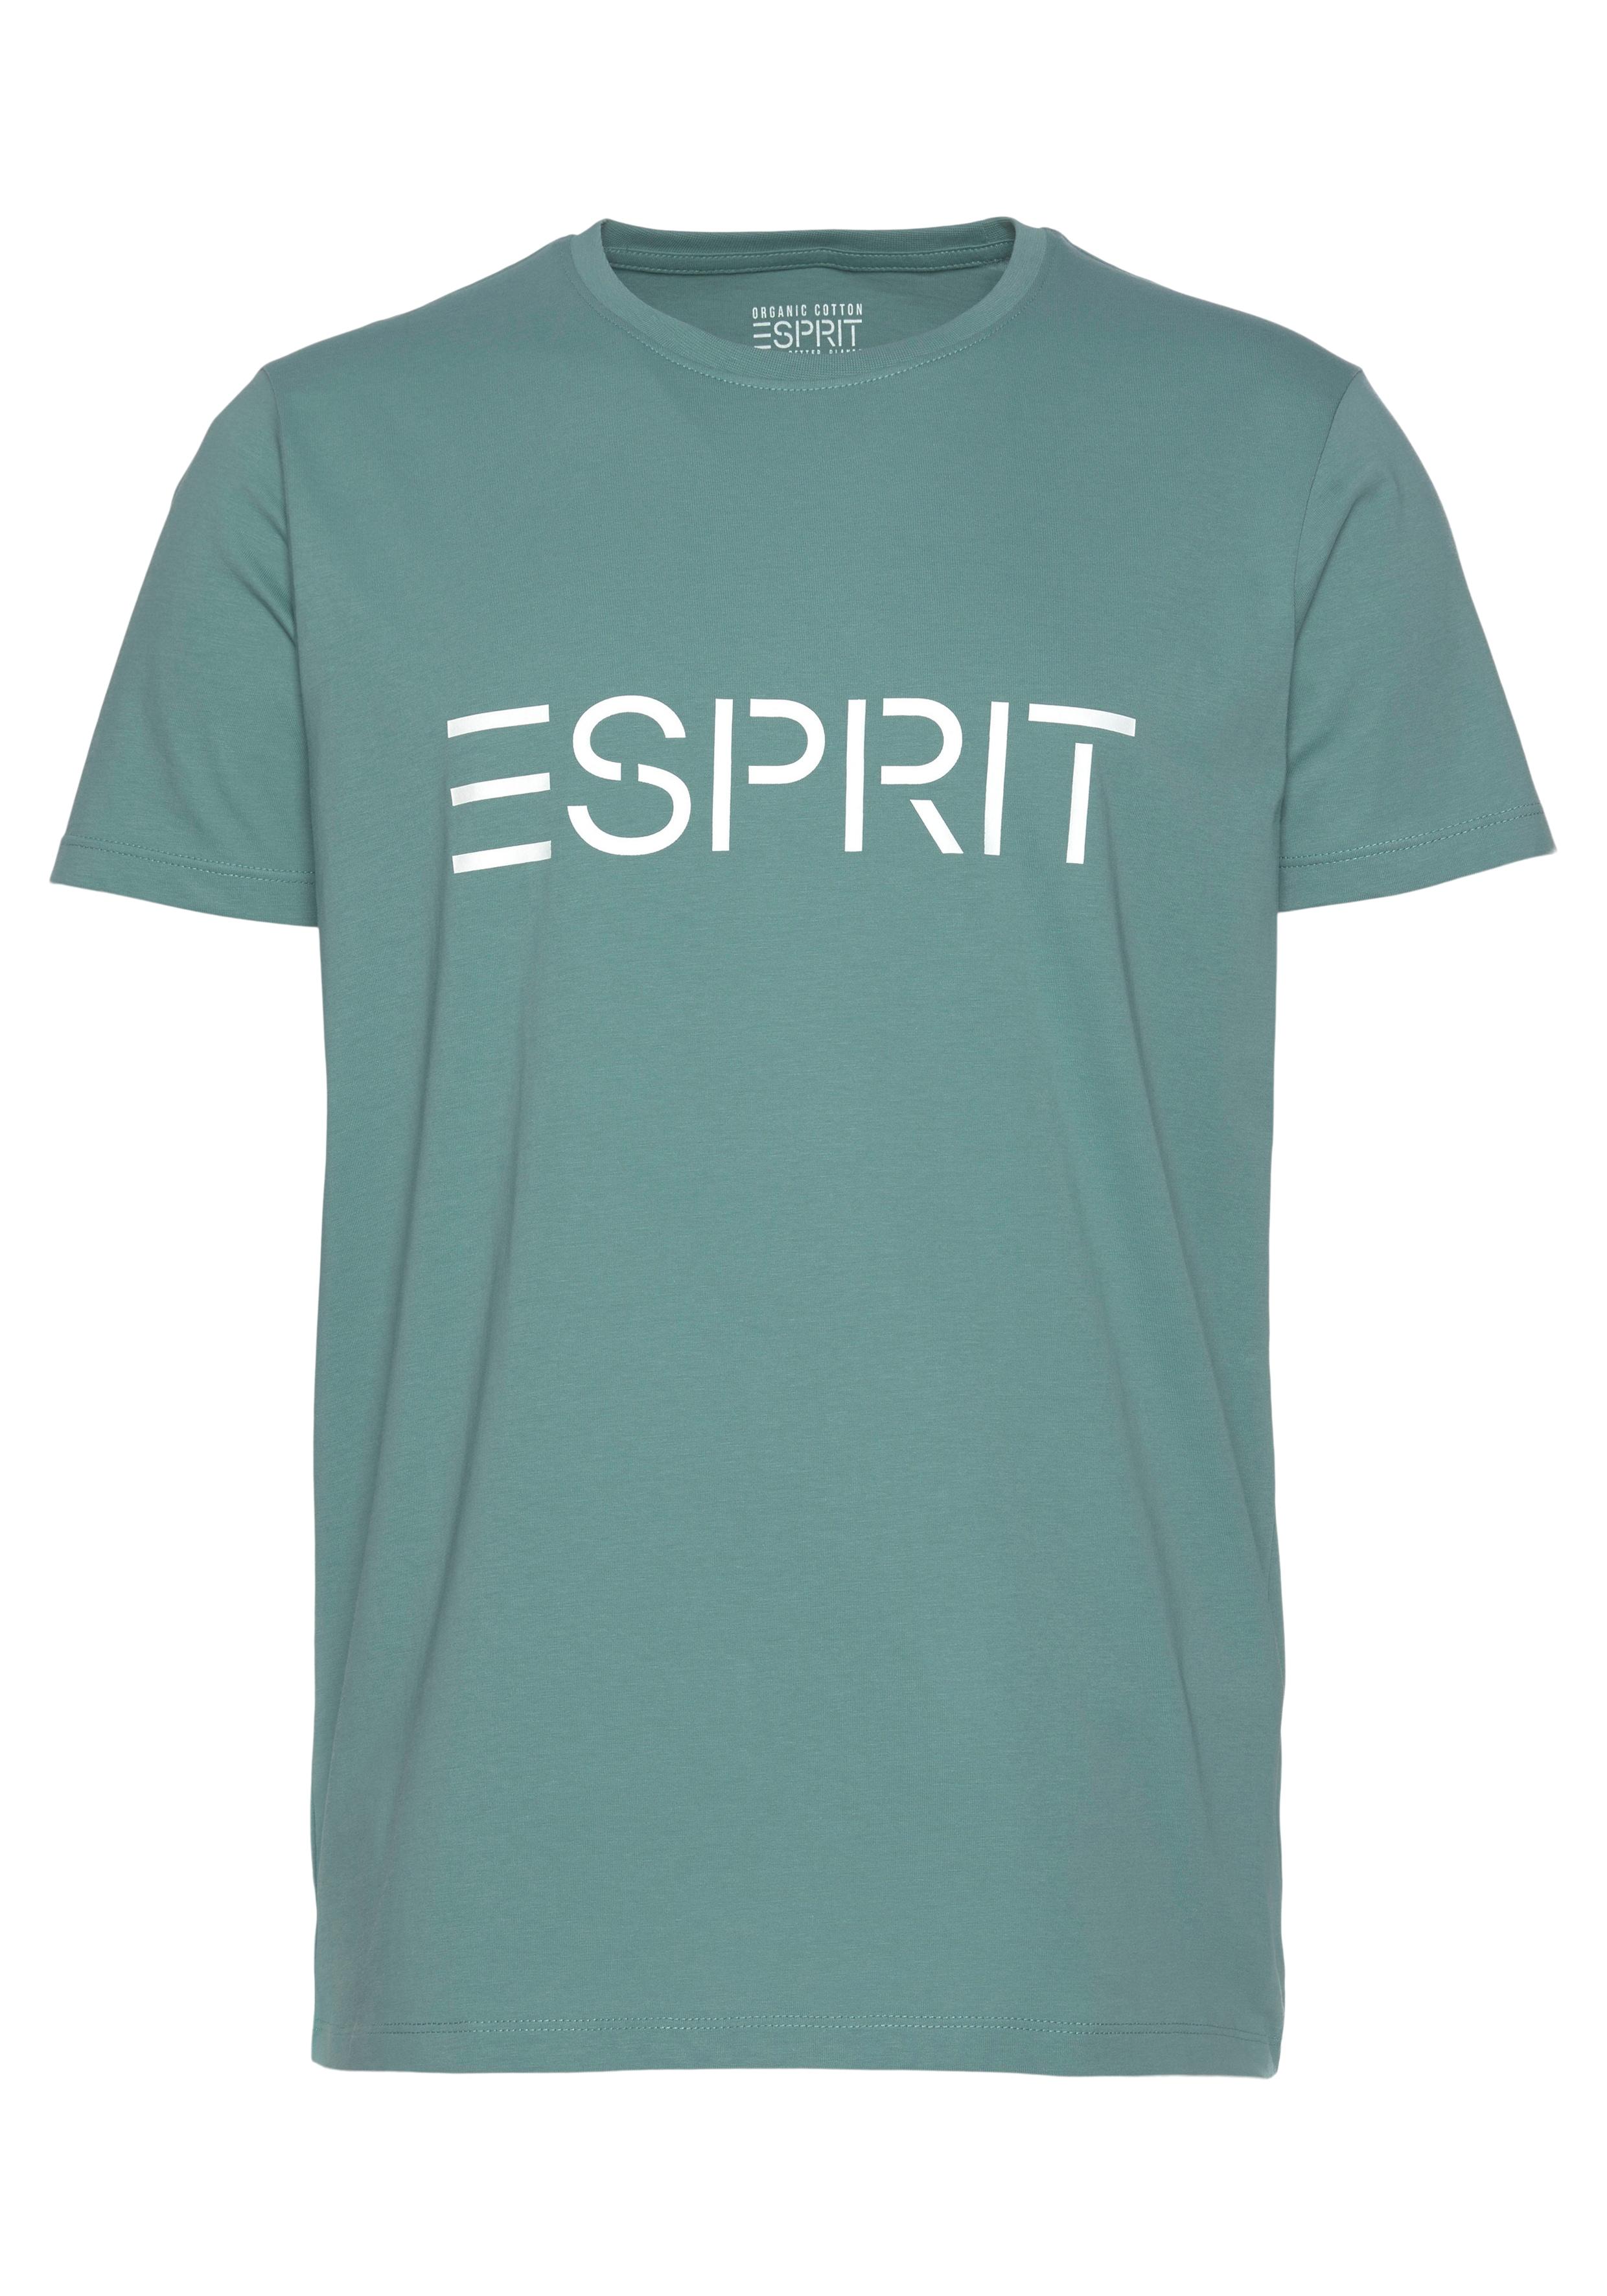 esprit -  T-Shirt, mit Logofrontprint